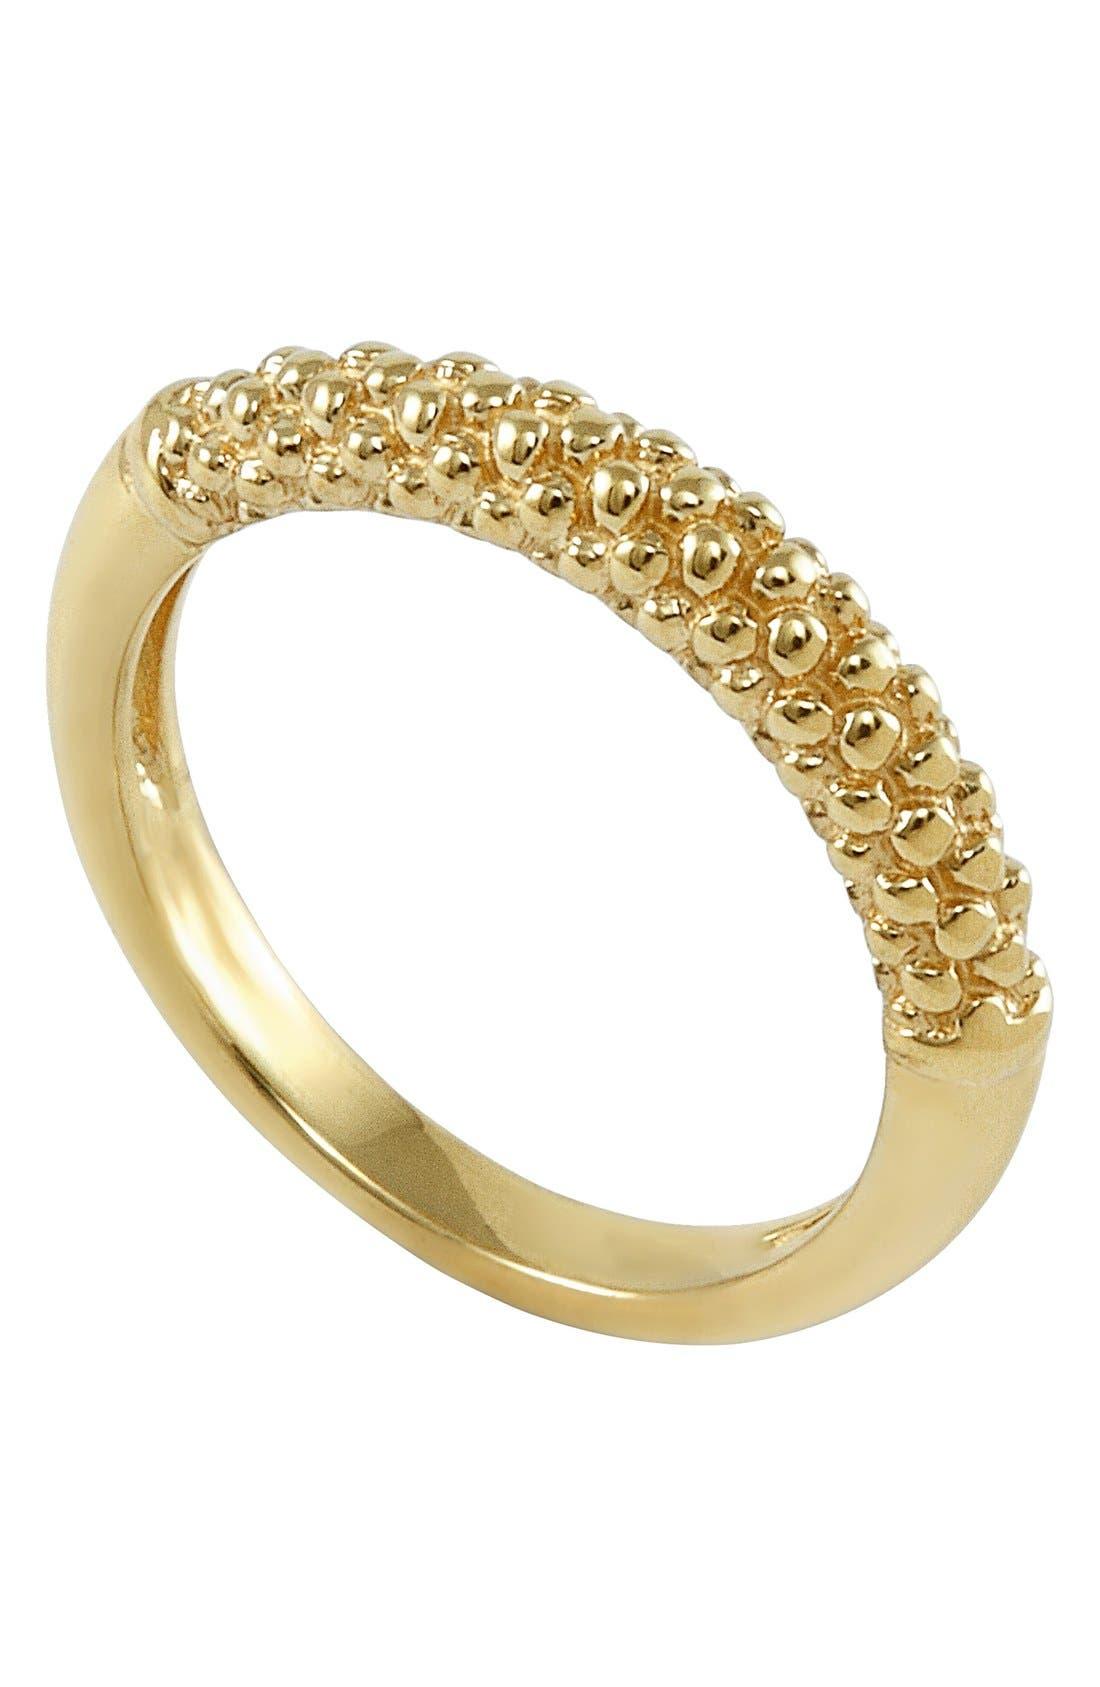 LAGOS Caviar Band Ring